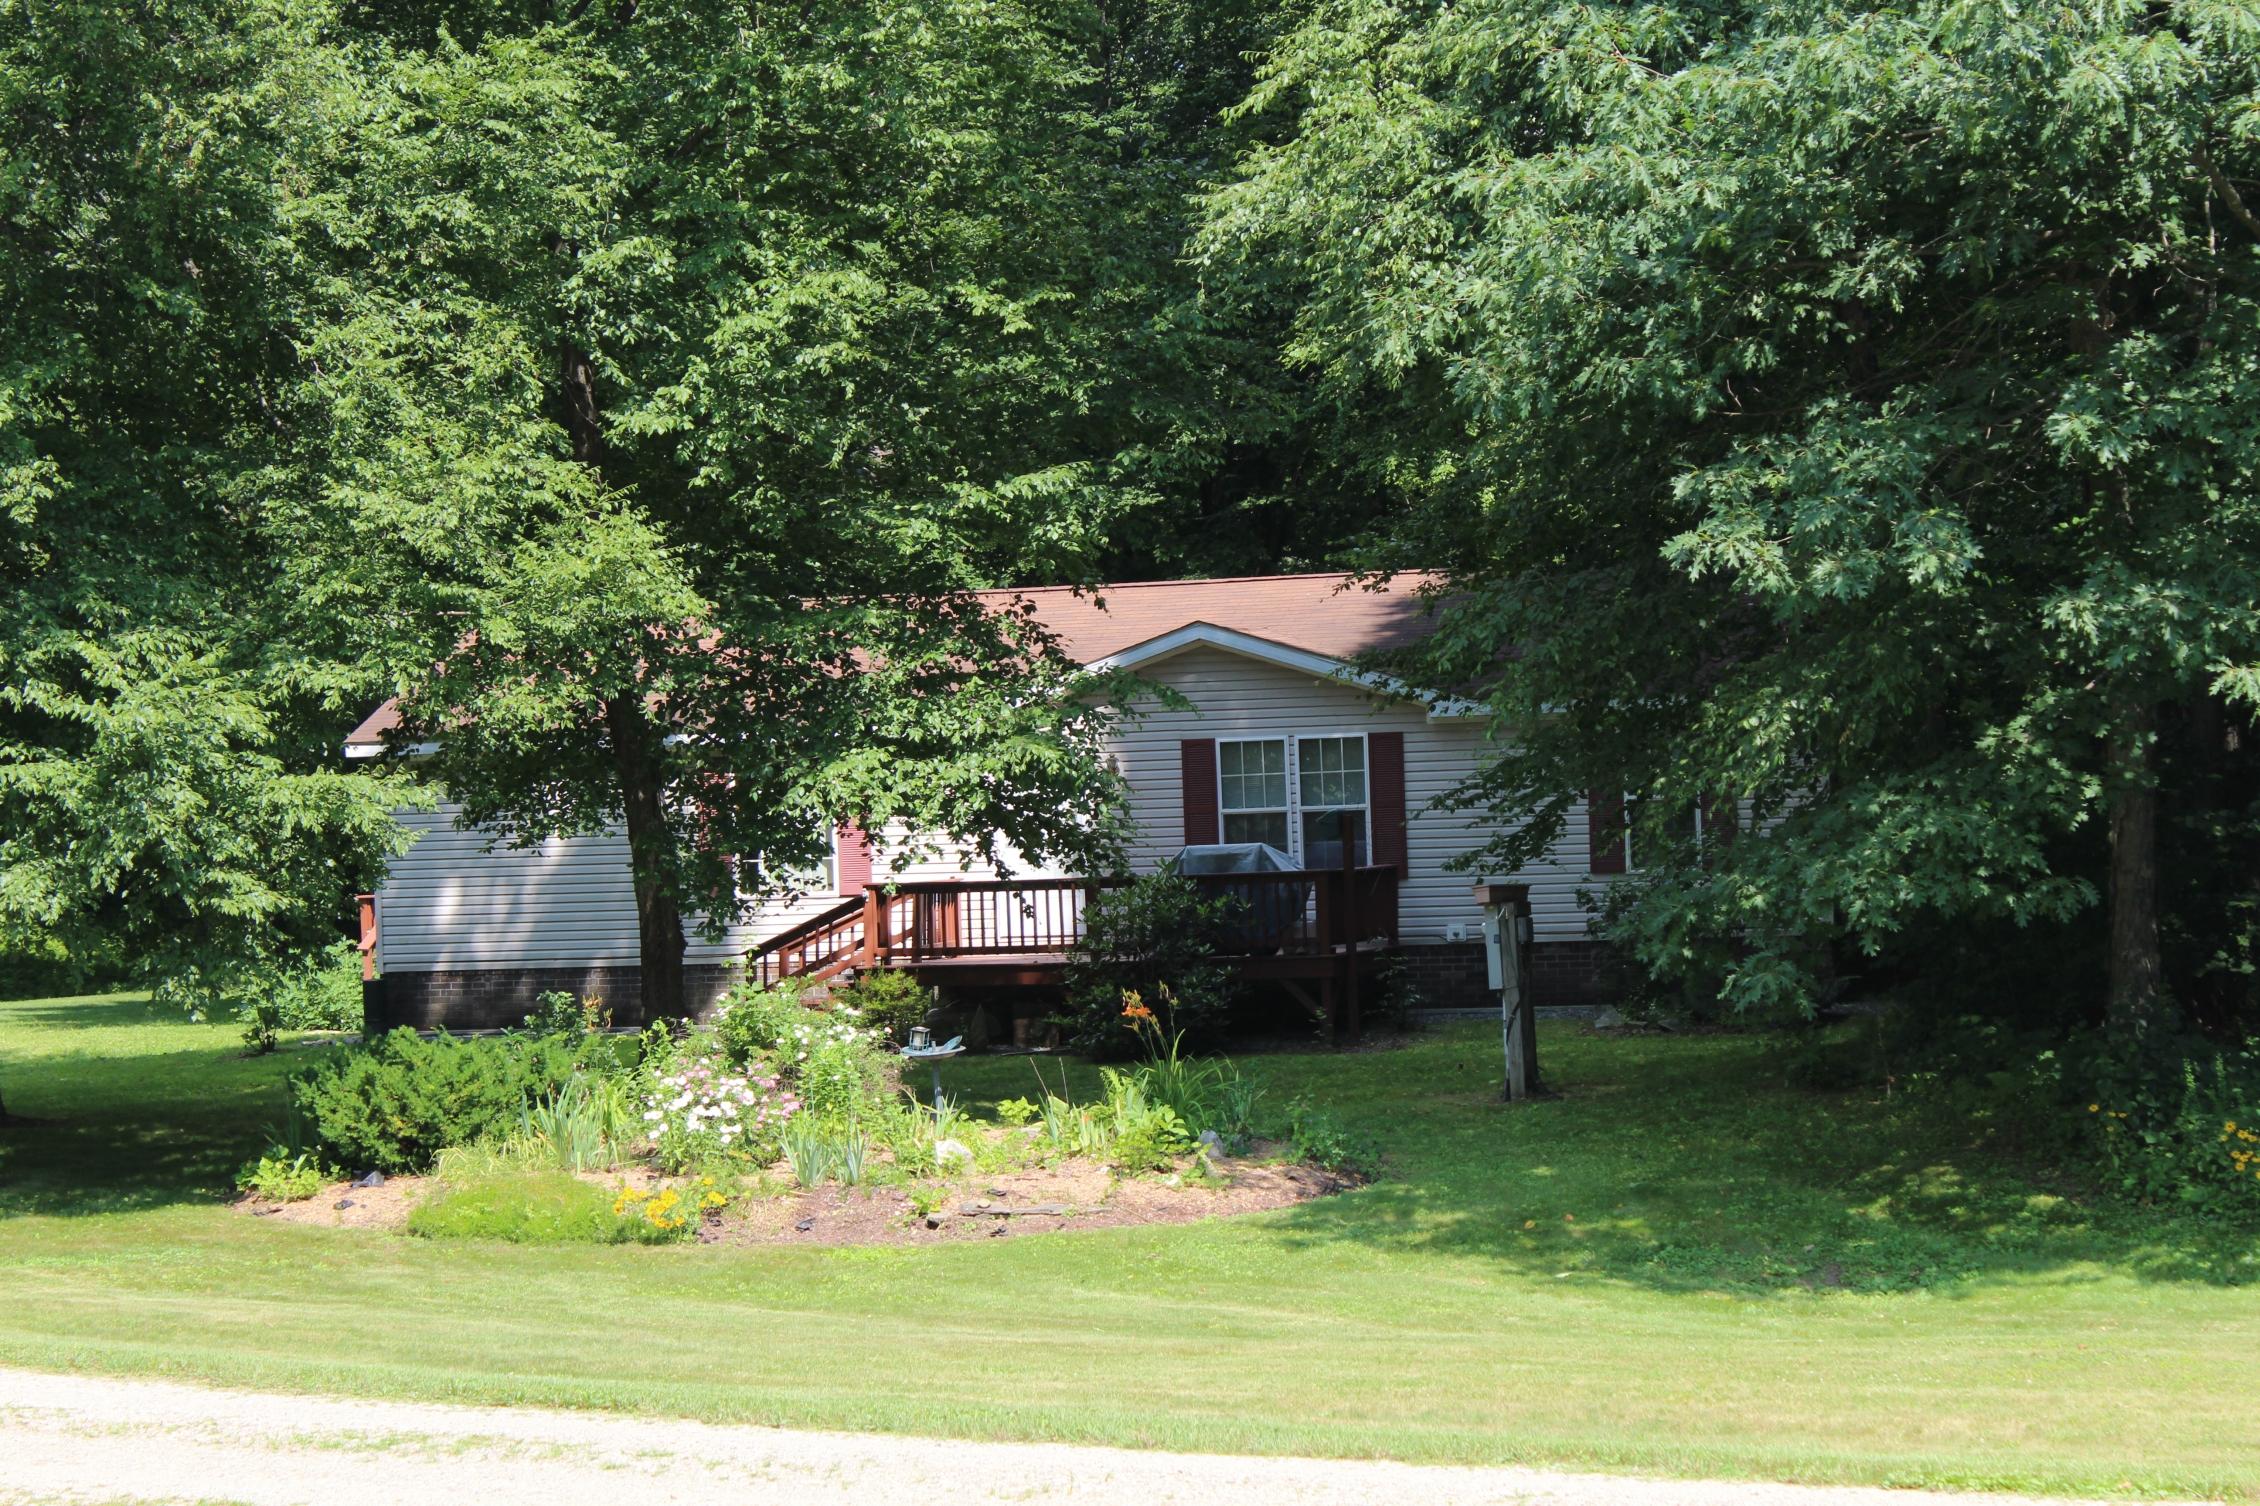 Casa para uma família para Venda às 130 Cherry Lane, Weathersfield 130 Cherry Ln Weathersfield, Vermont, 05030 Estados Unidos